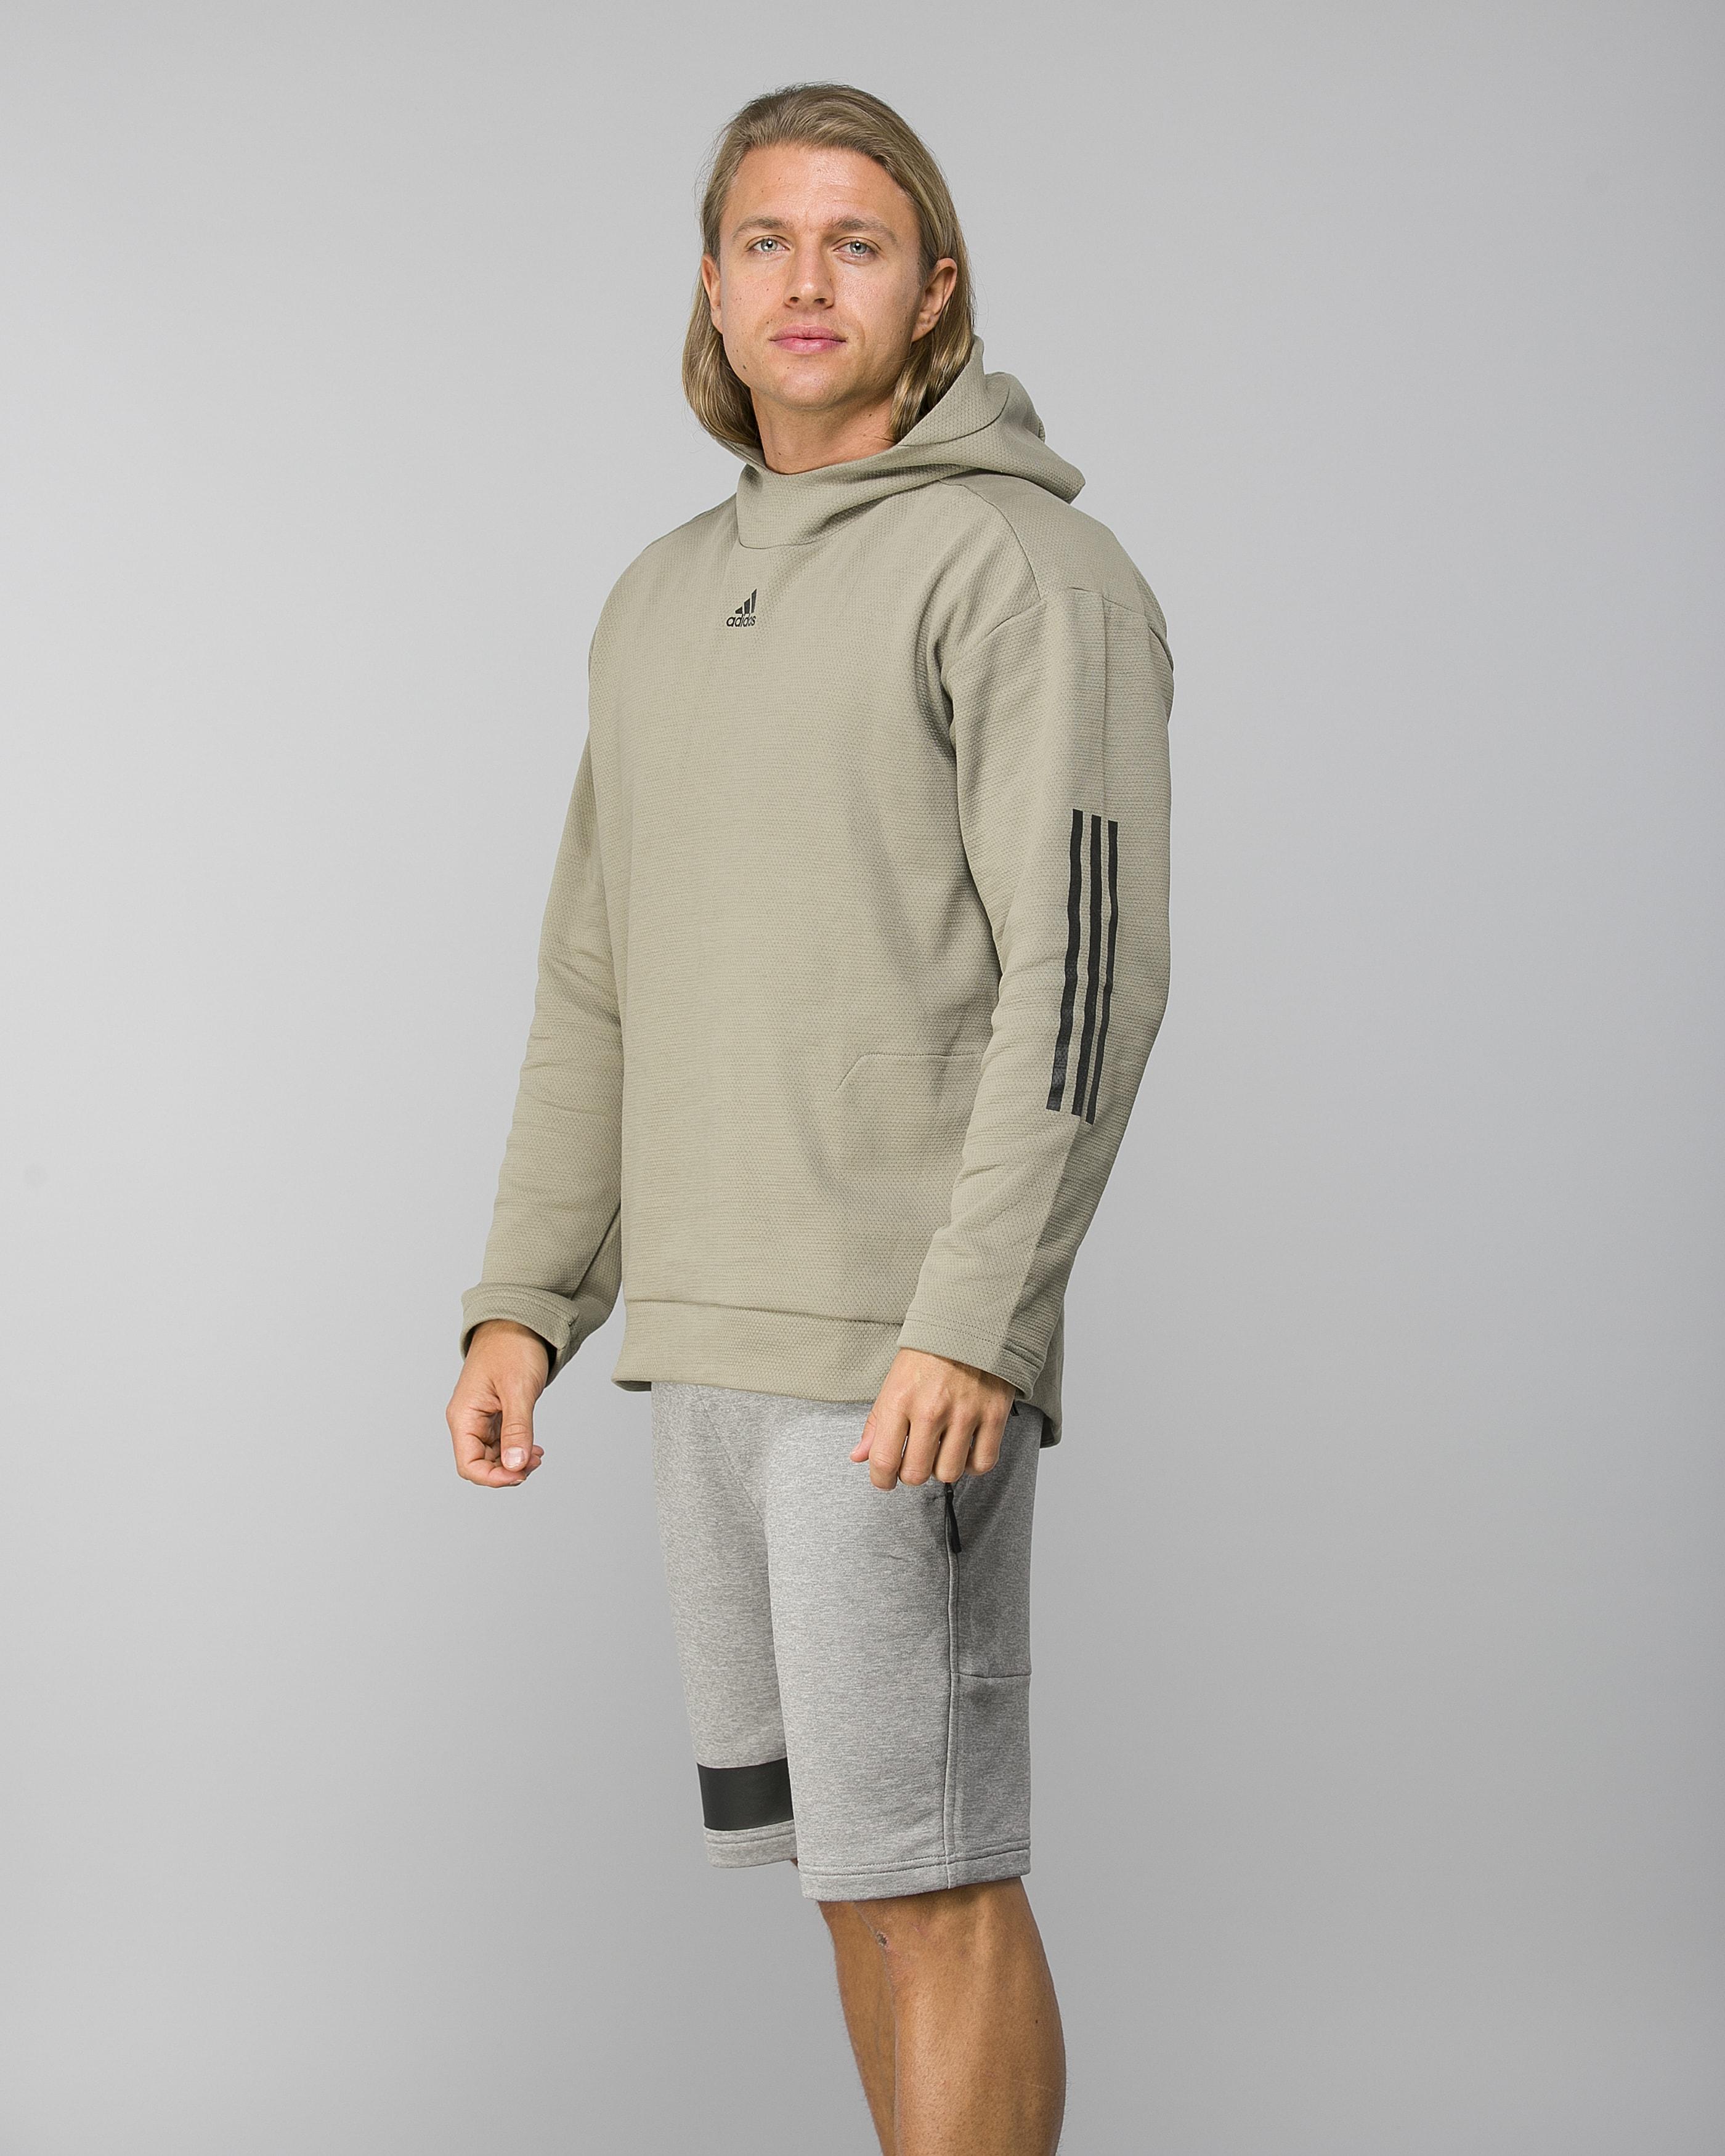 Adidas ID Champ Hettegenser Trace Cargo Tights.no